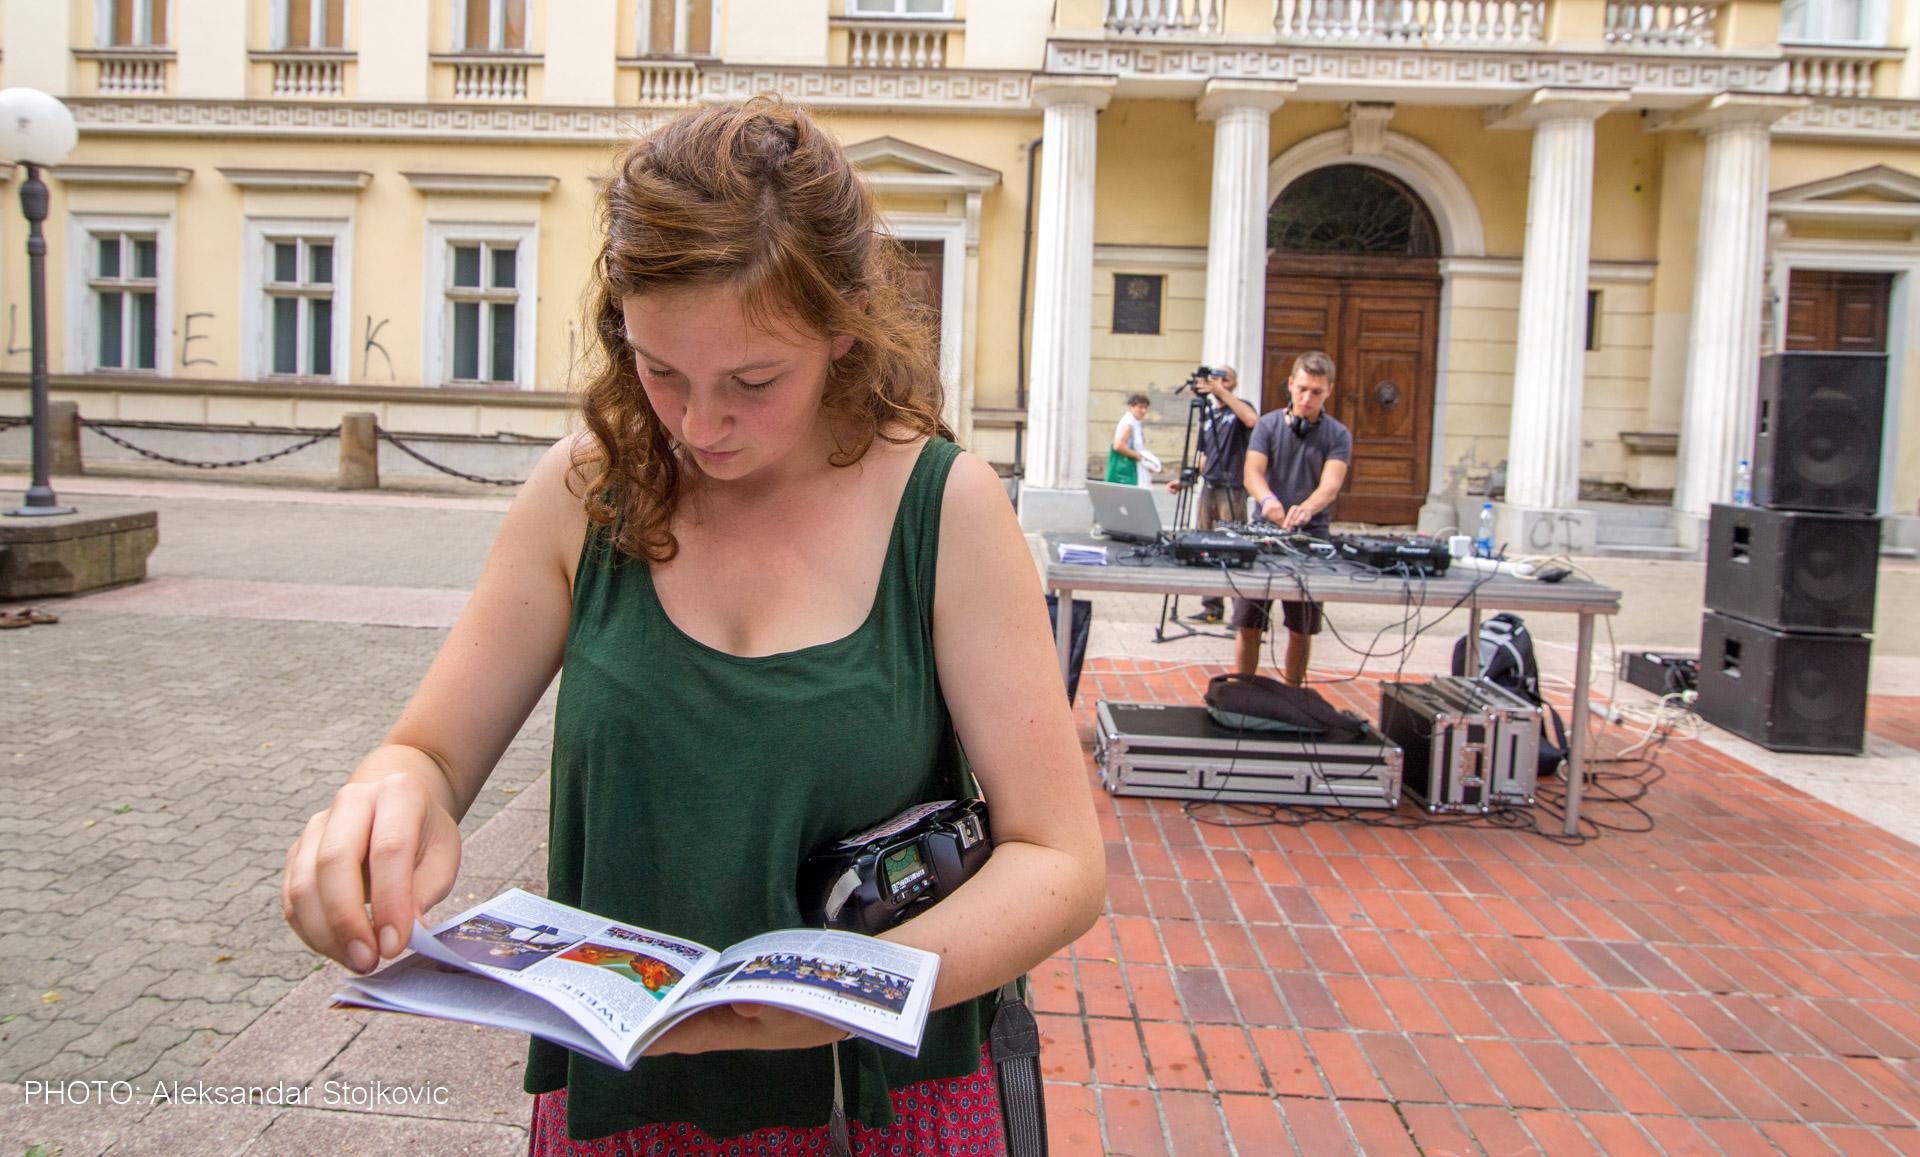 Freedom art festival Pančevo 2016